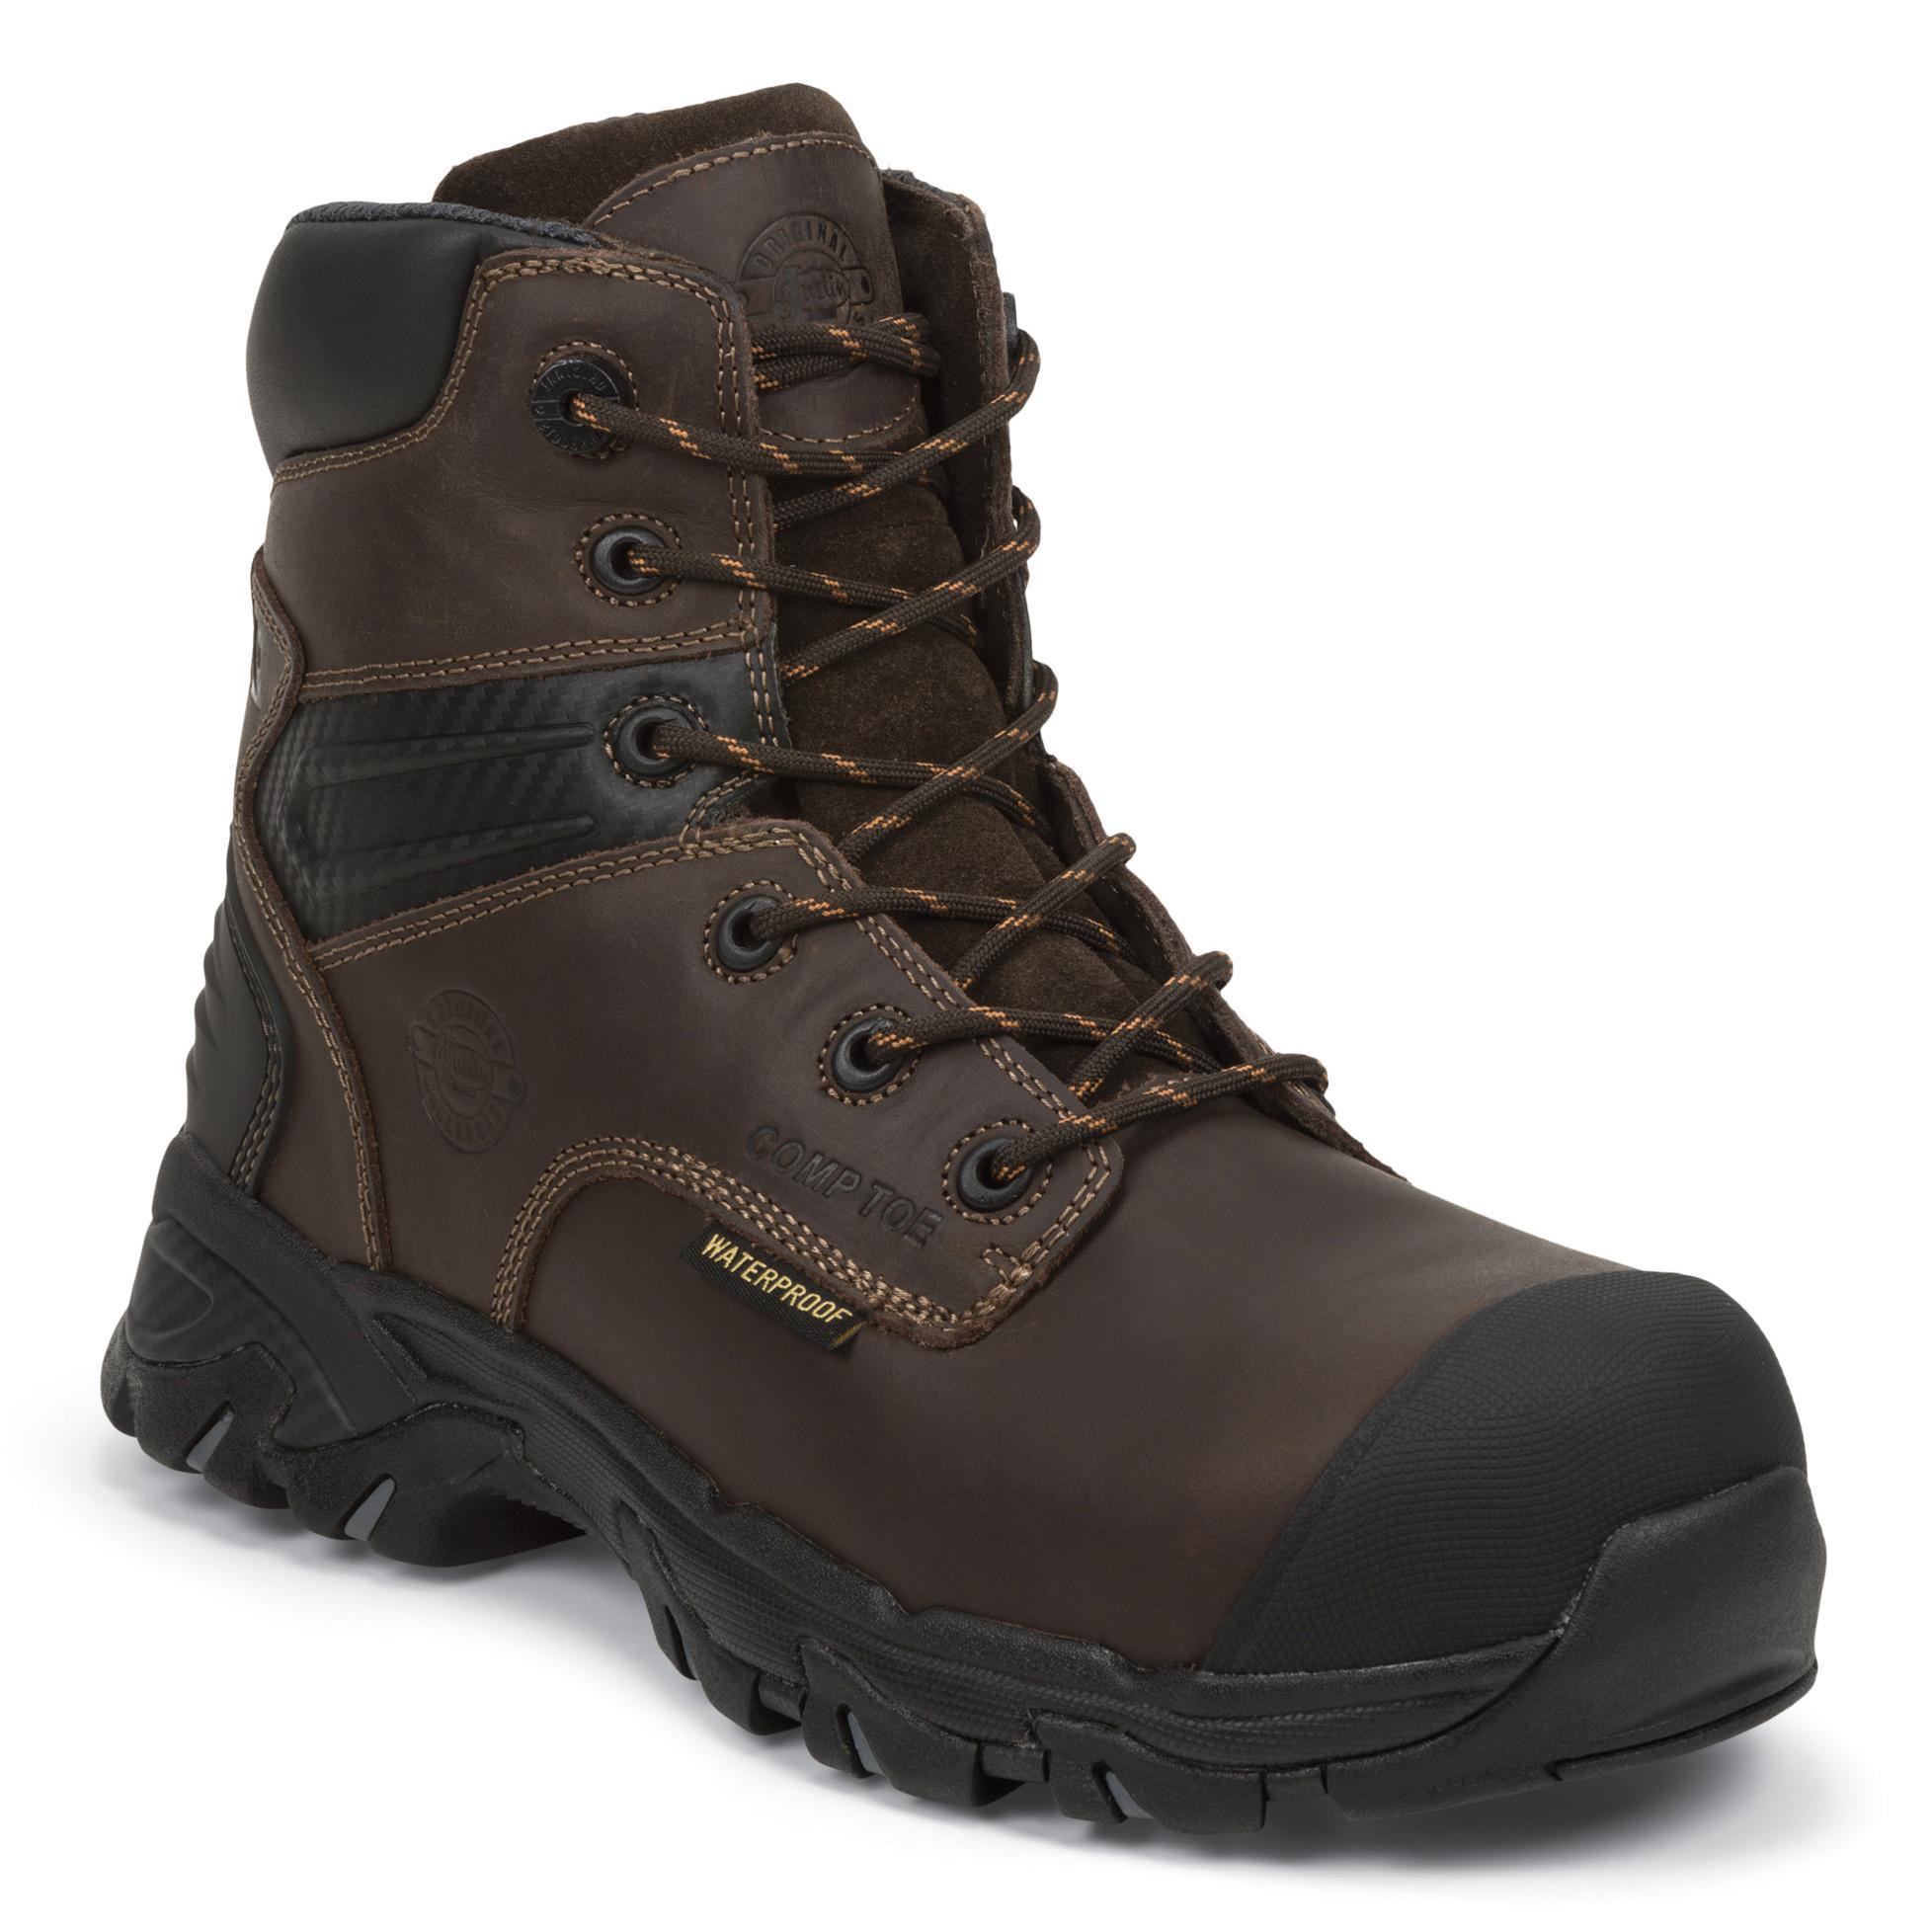 ccdbe978b02 Justin Work Work-Tek Composite Toe Waterproof 200g Insulated Work Boot